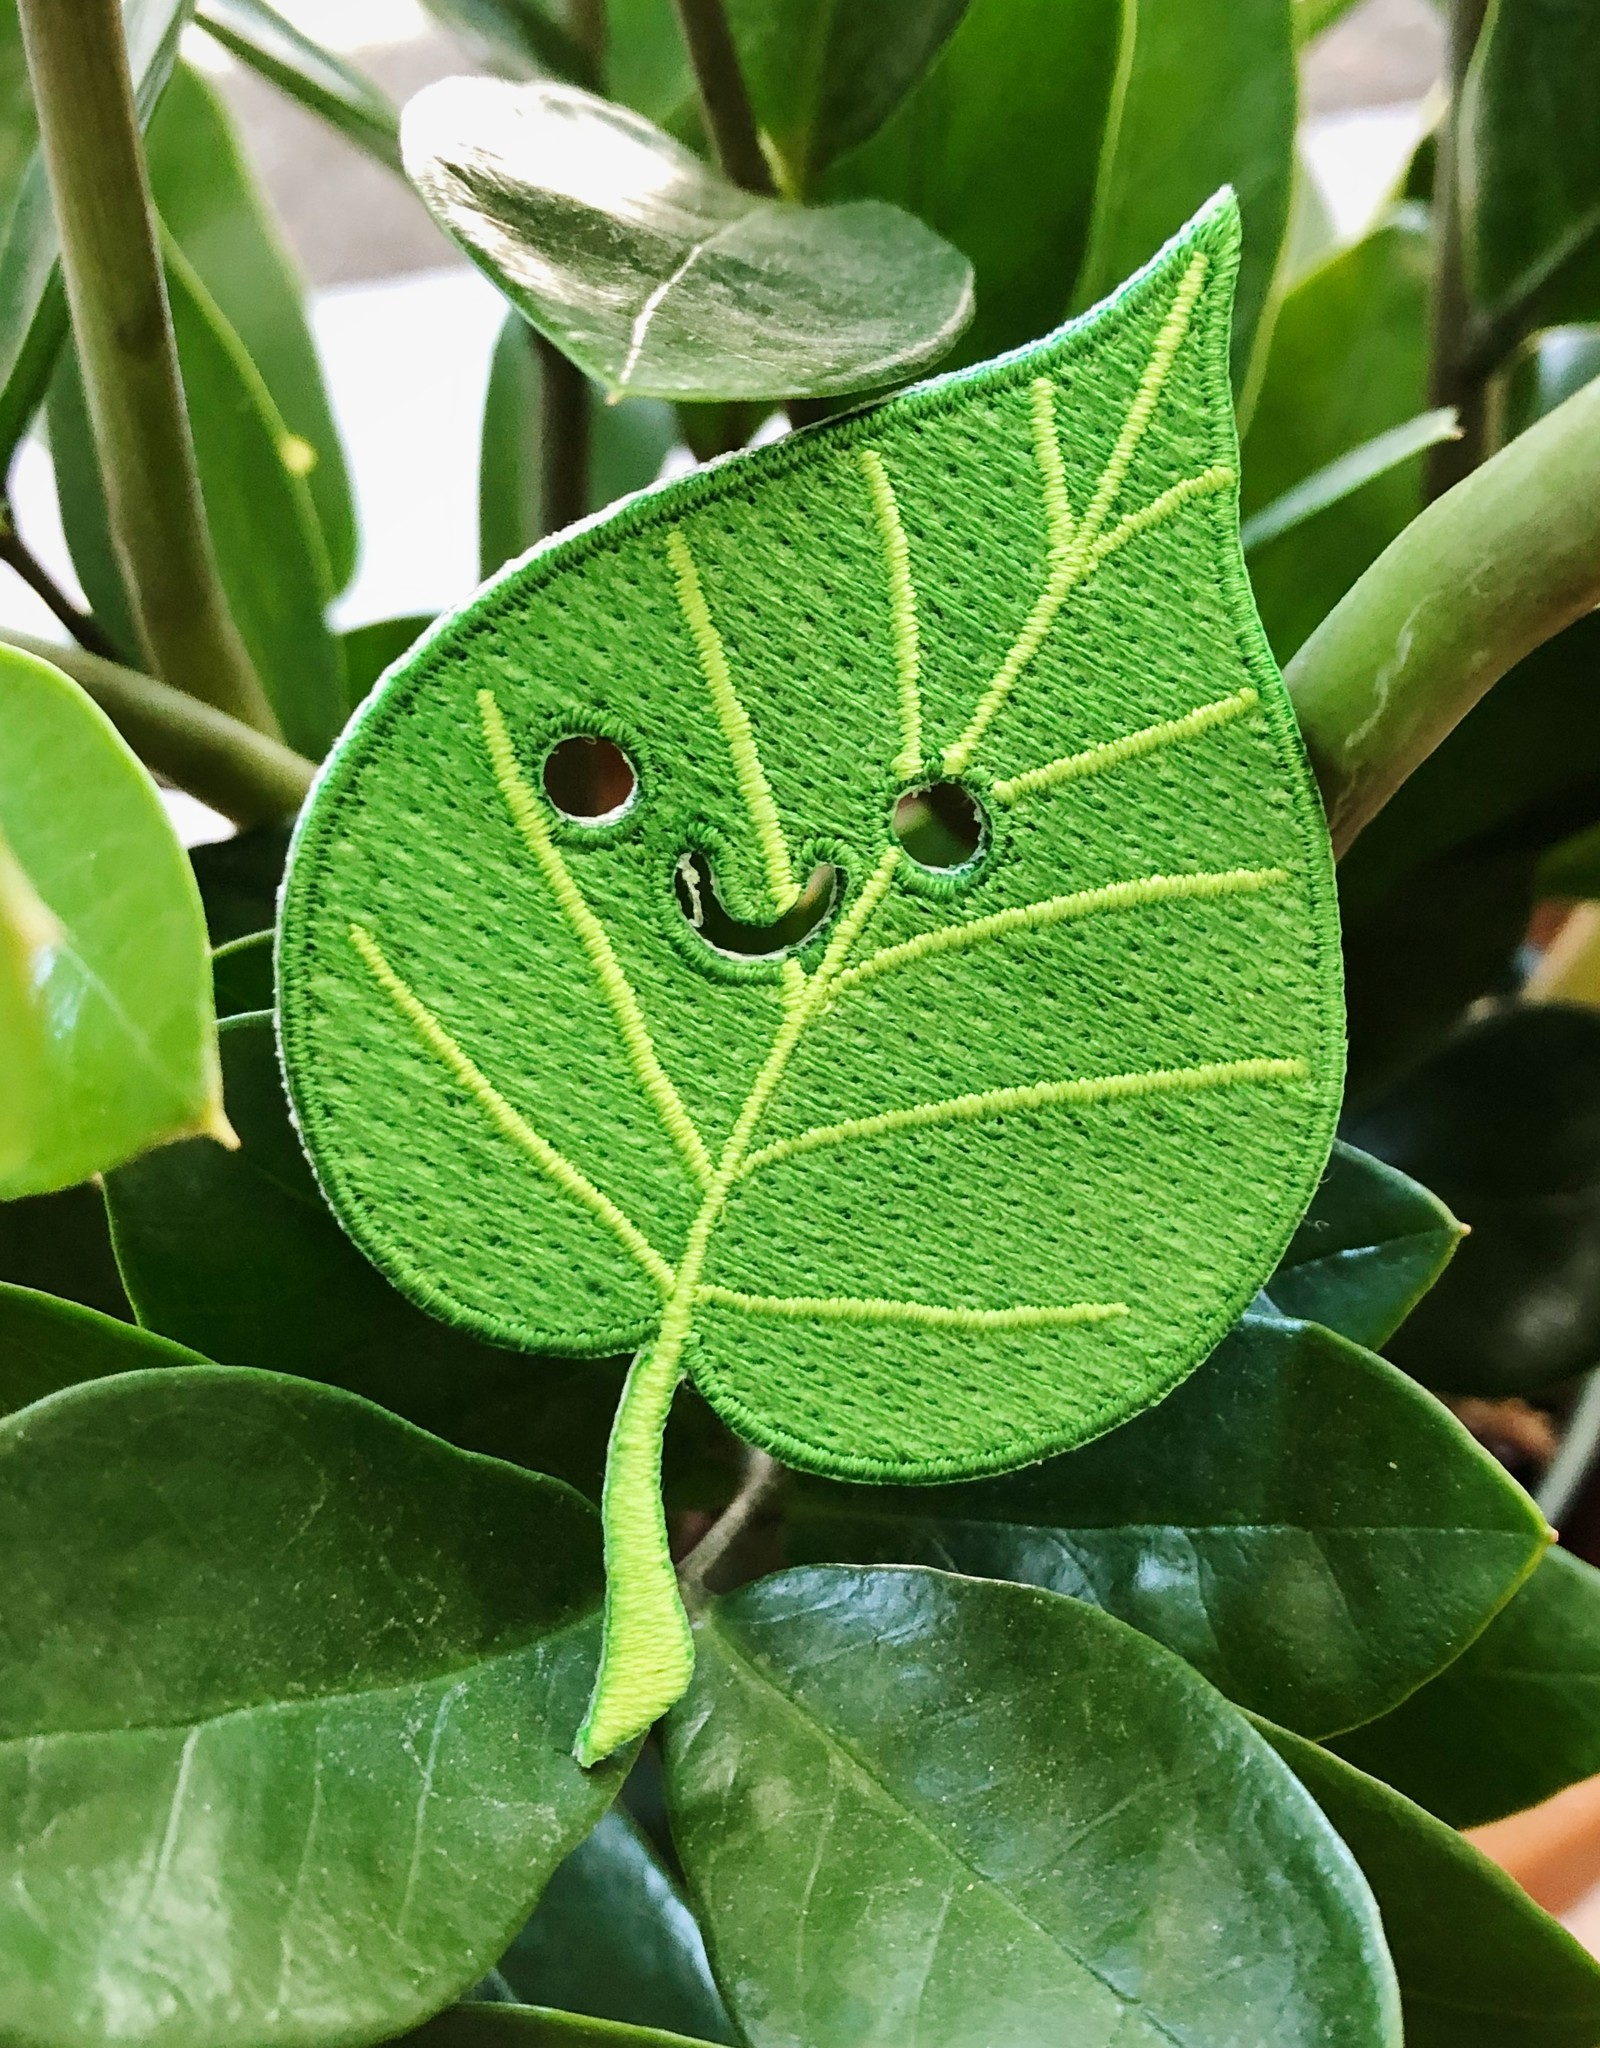 Smiley Leaf Patch